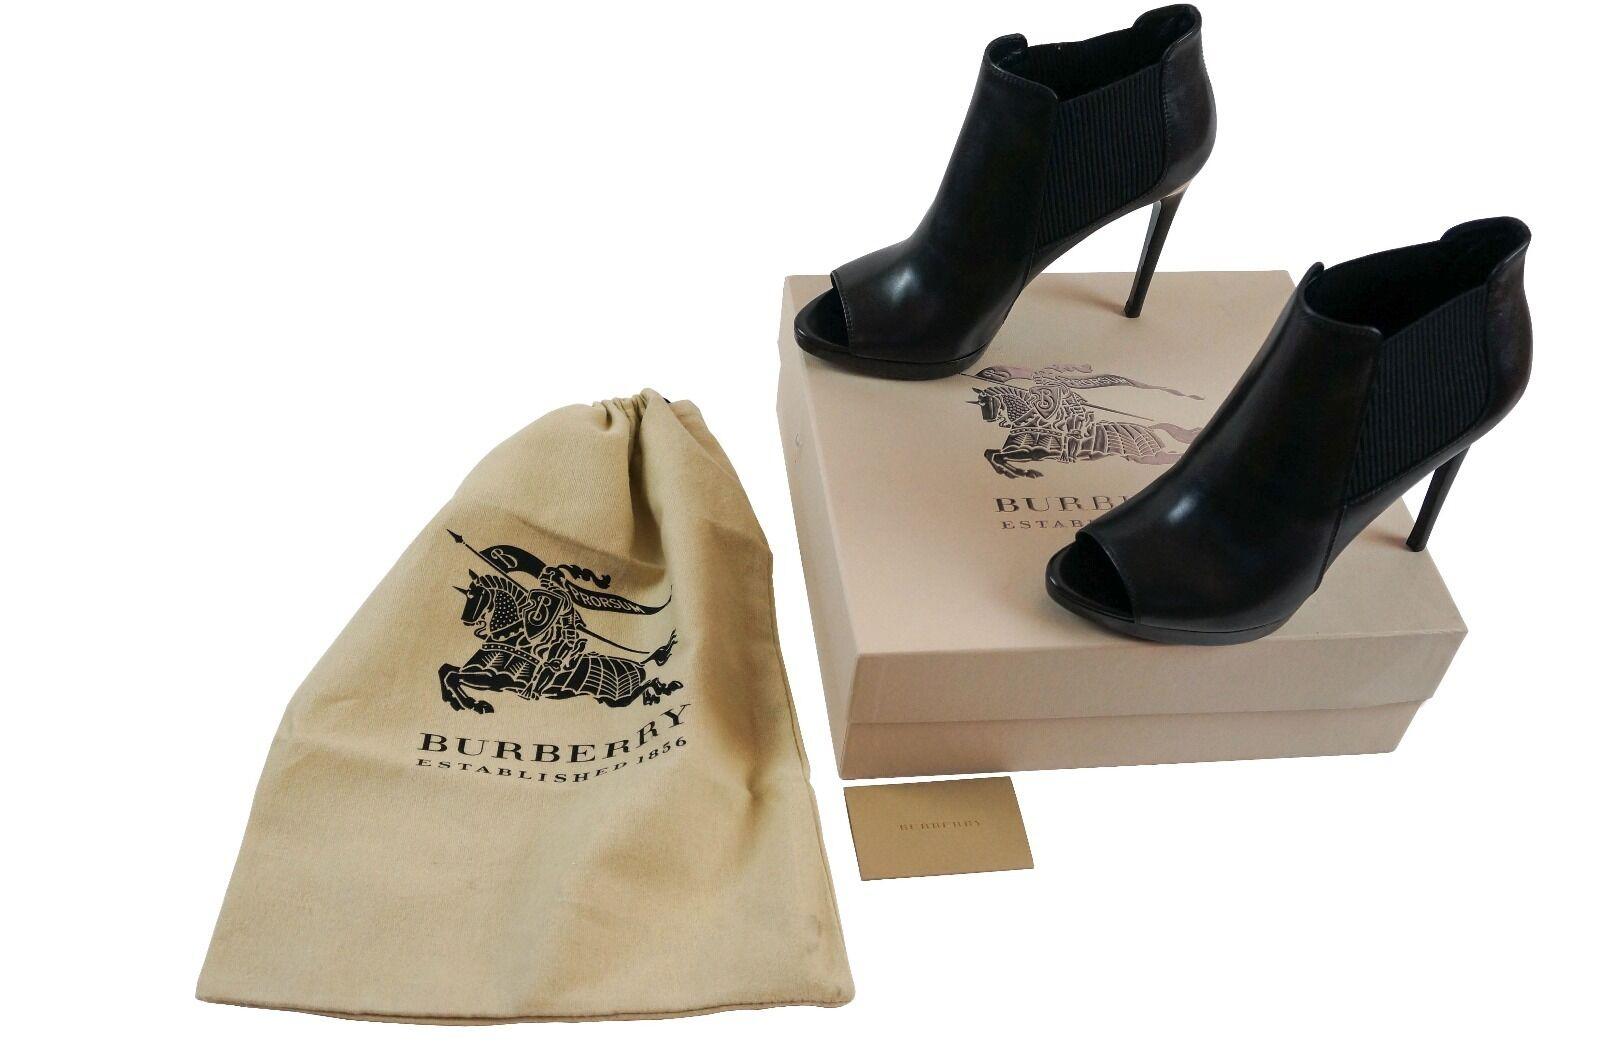 Genuine Burberry leather pip-toe ankle Stiefel Größe Größe Größe 39.5_new 83aabe